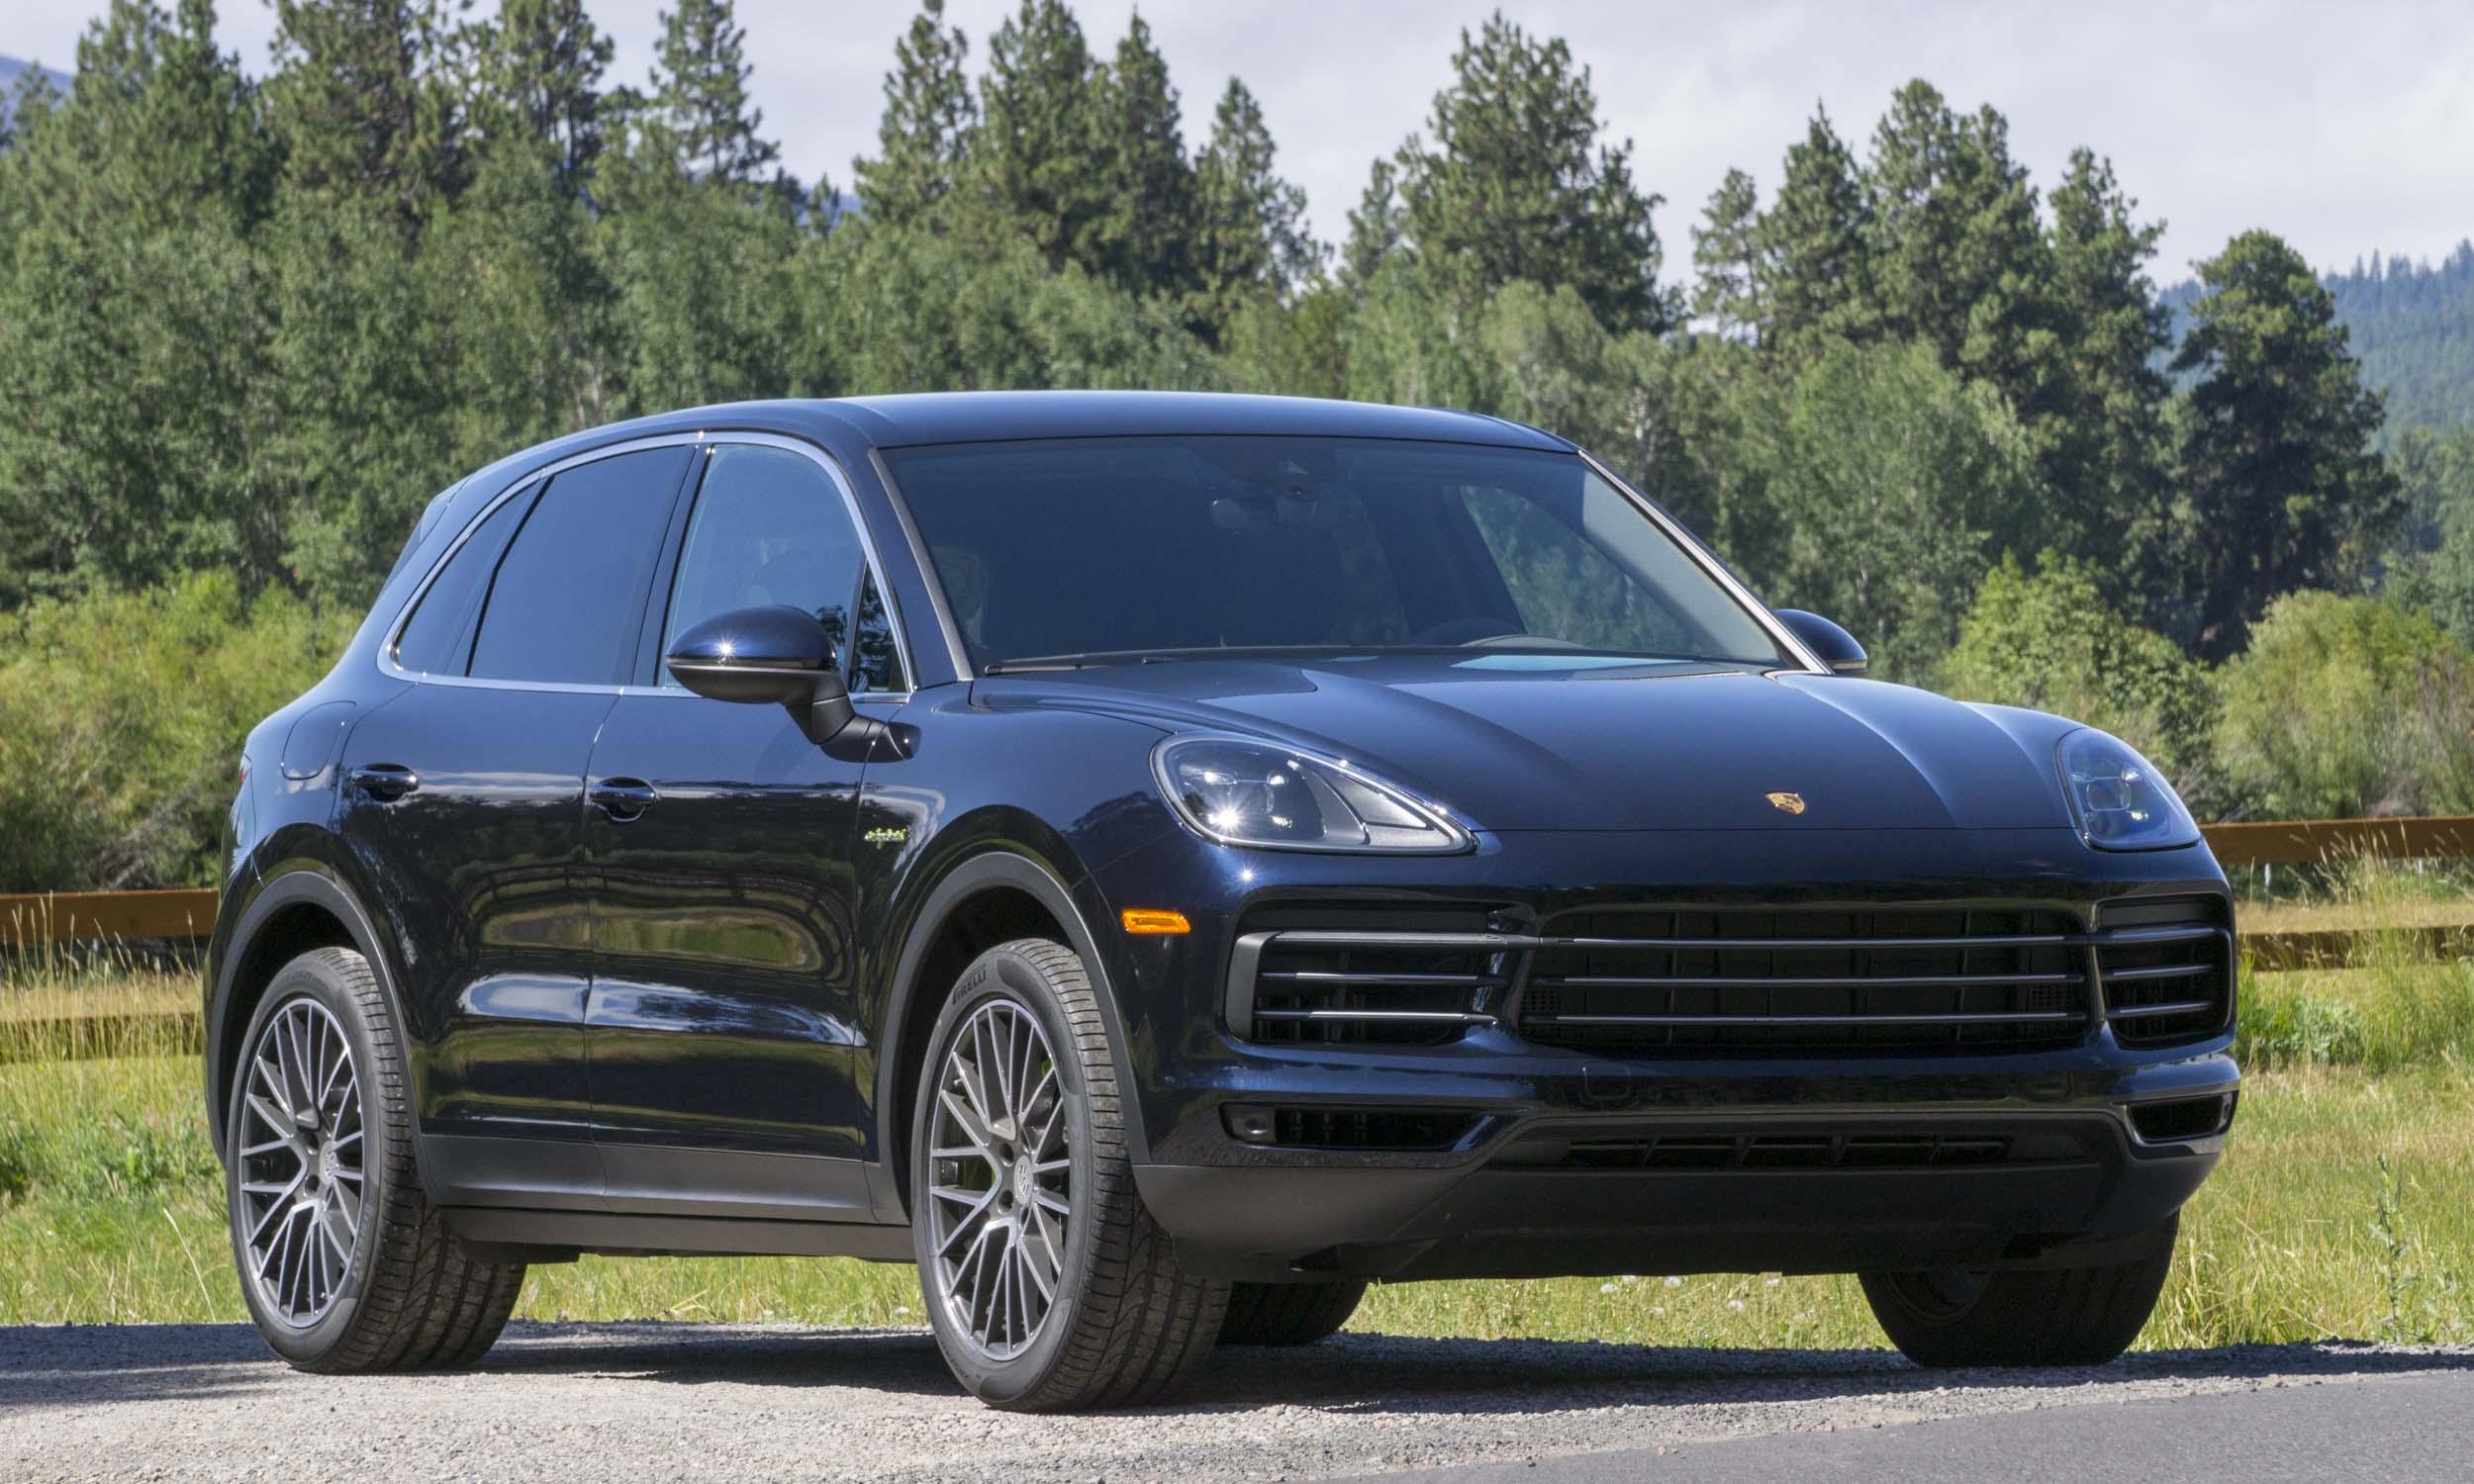 2019 Porsche Cayenne E-Hybrid: First Drive Review   Our Auto Expert